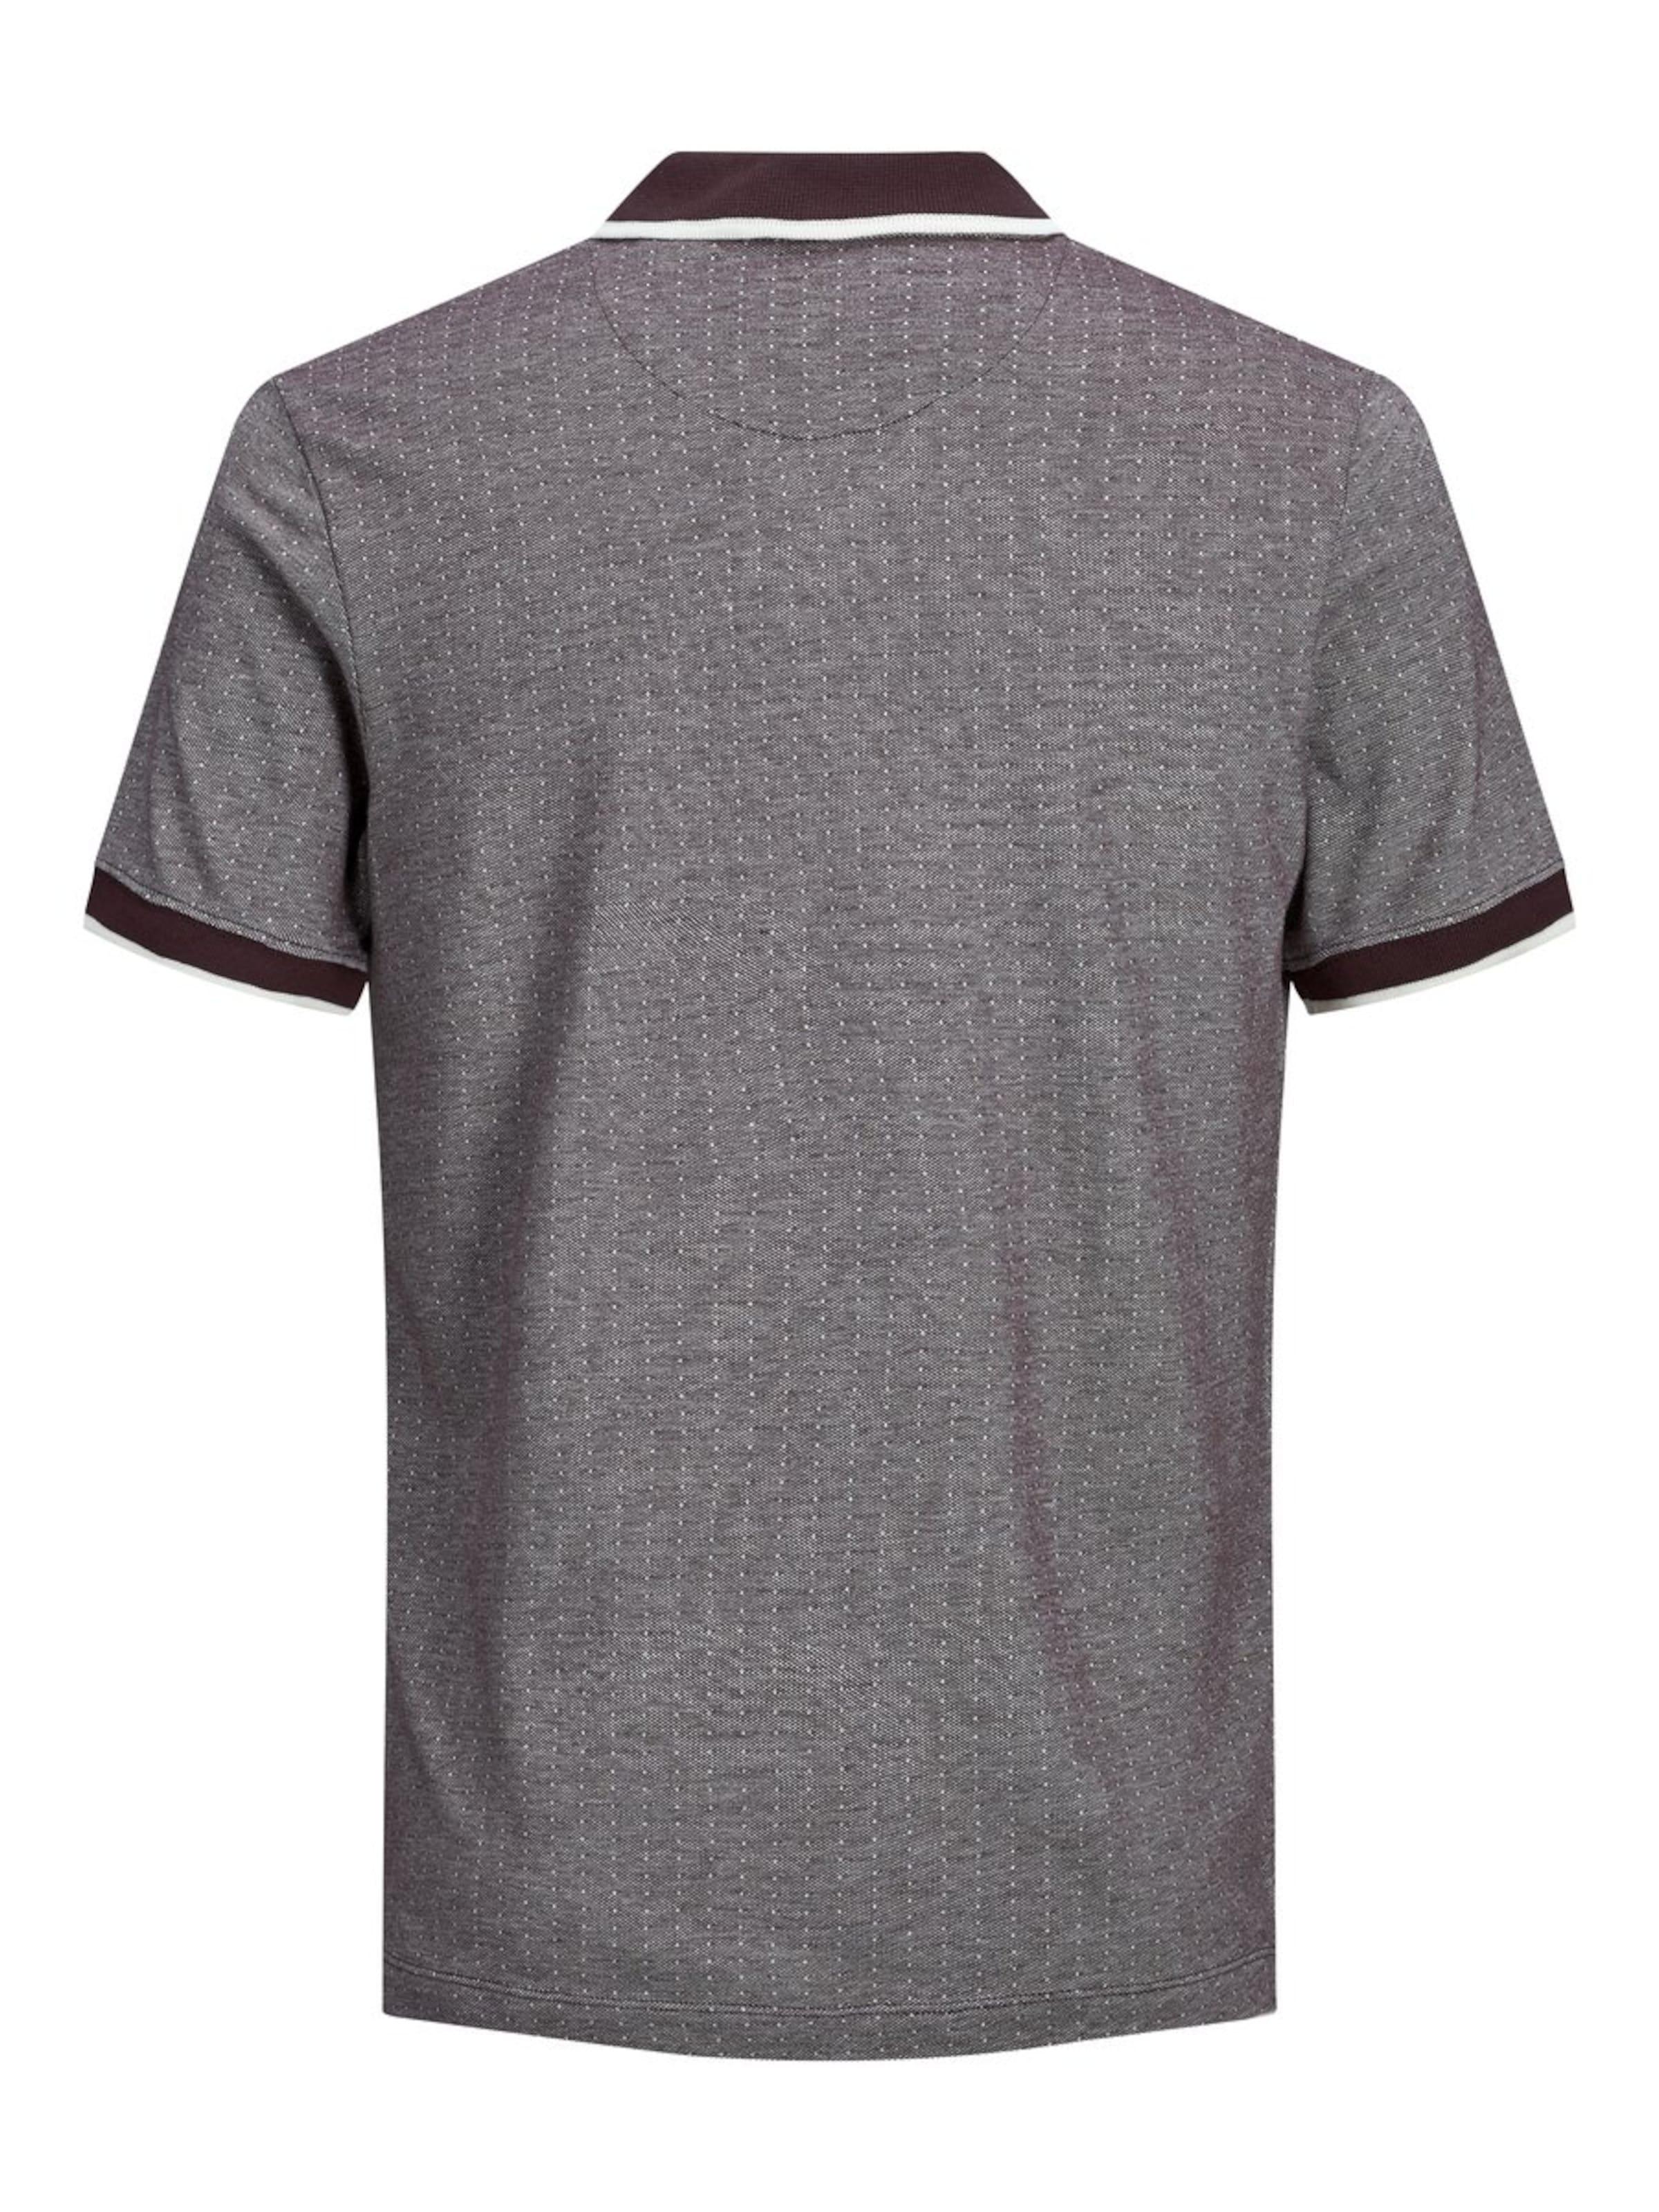 T shirt Foncé Jackamp; En Gris Jones PuOkZXTi